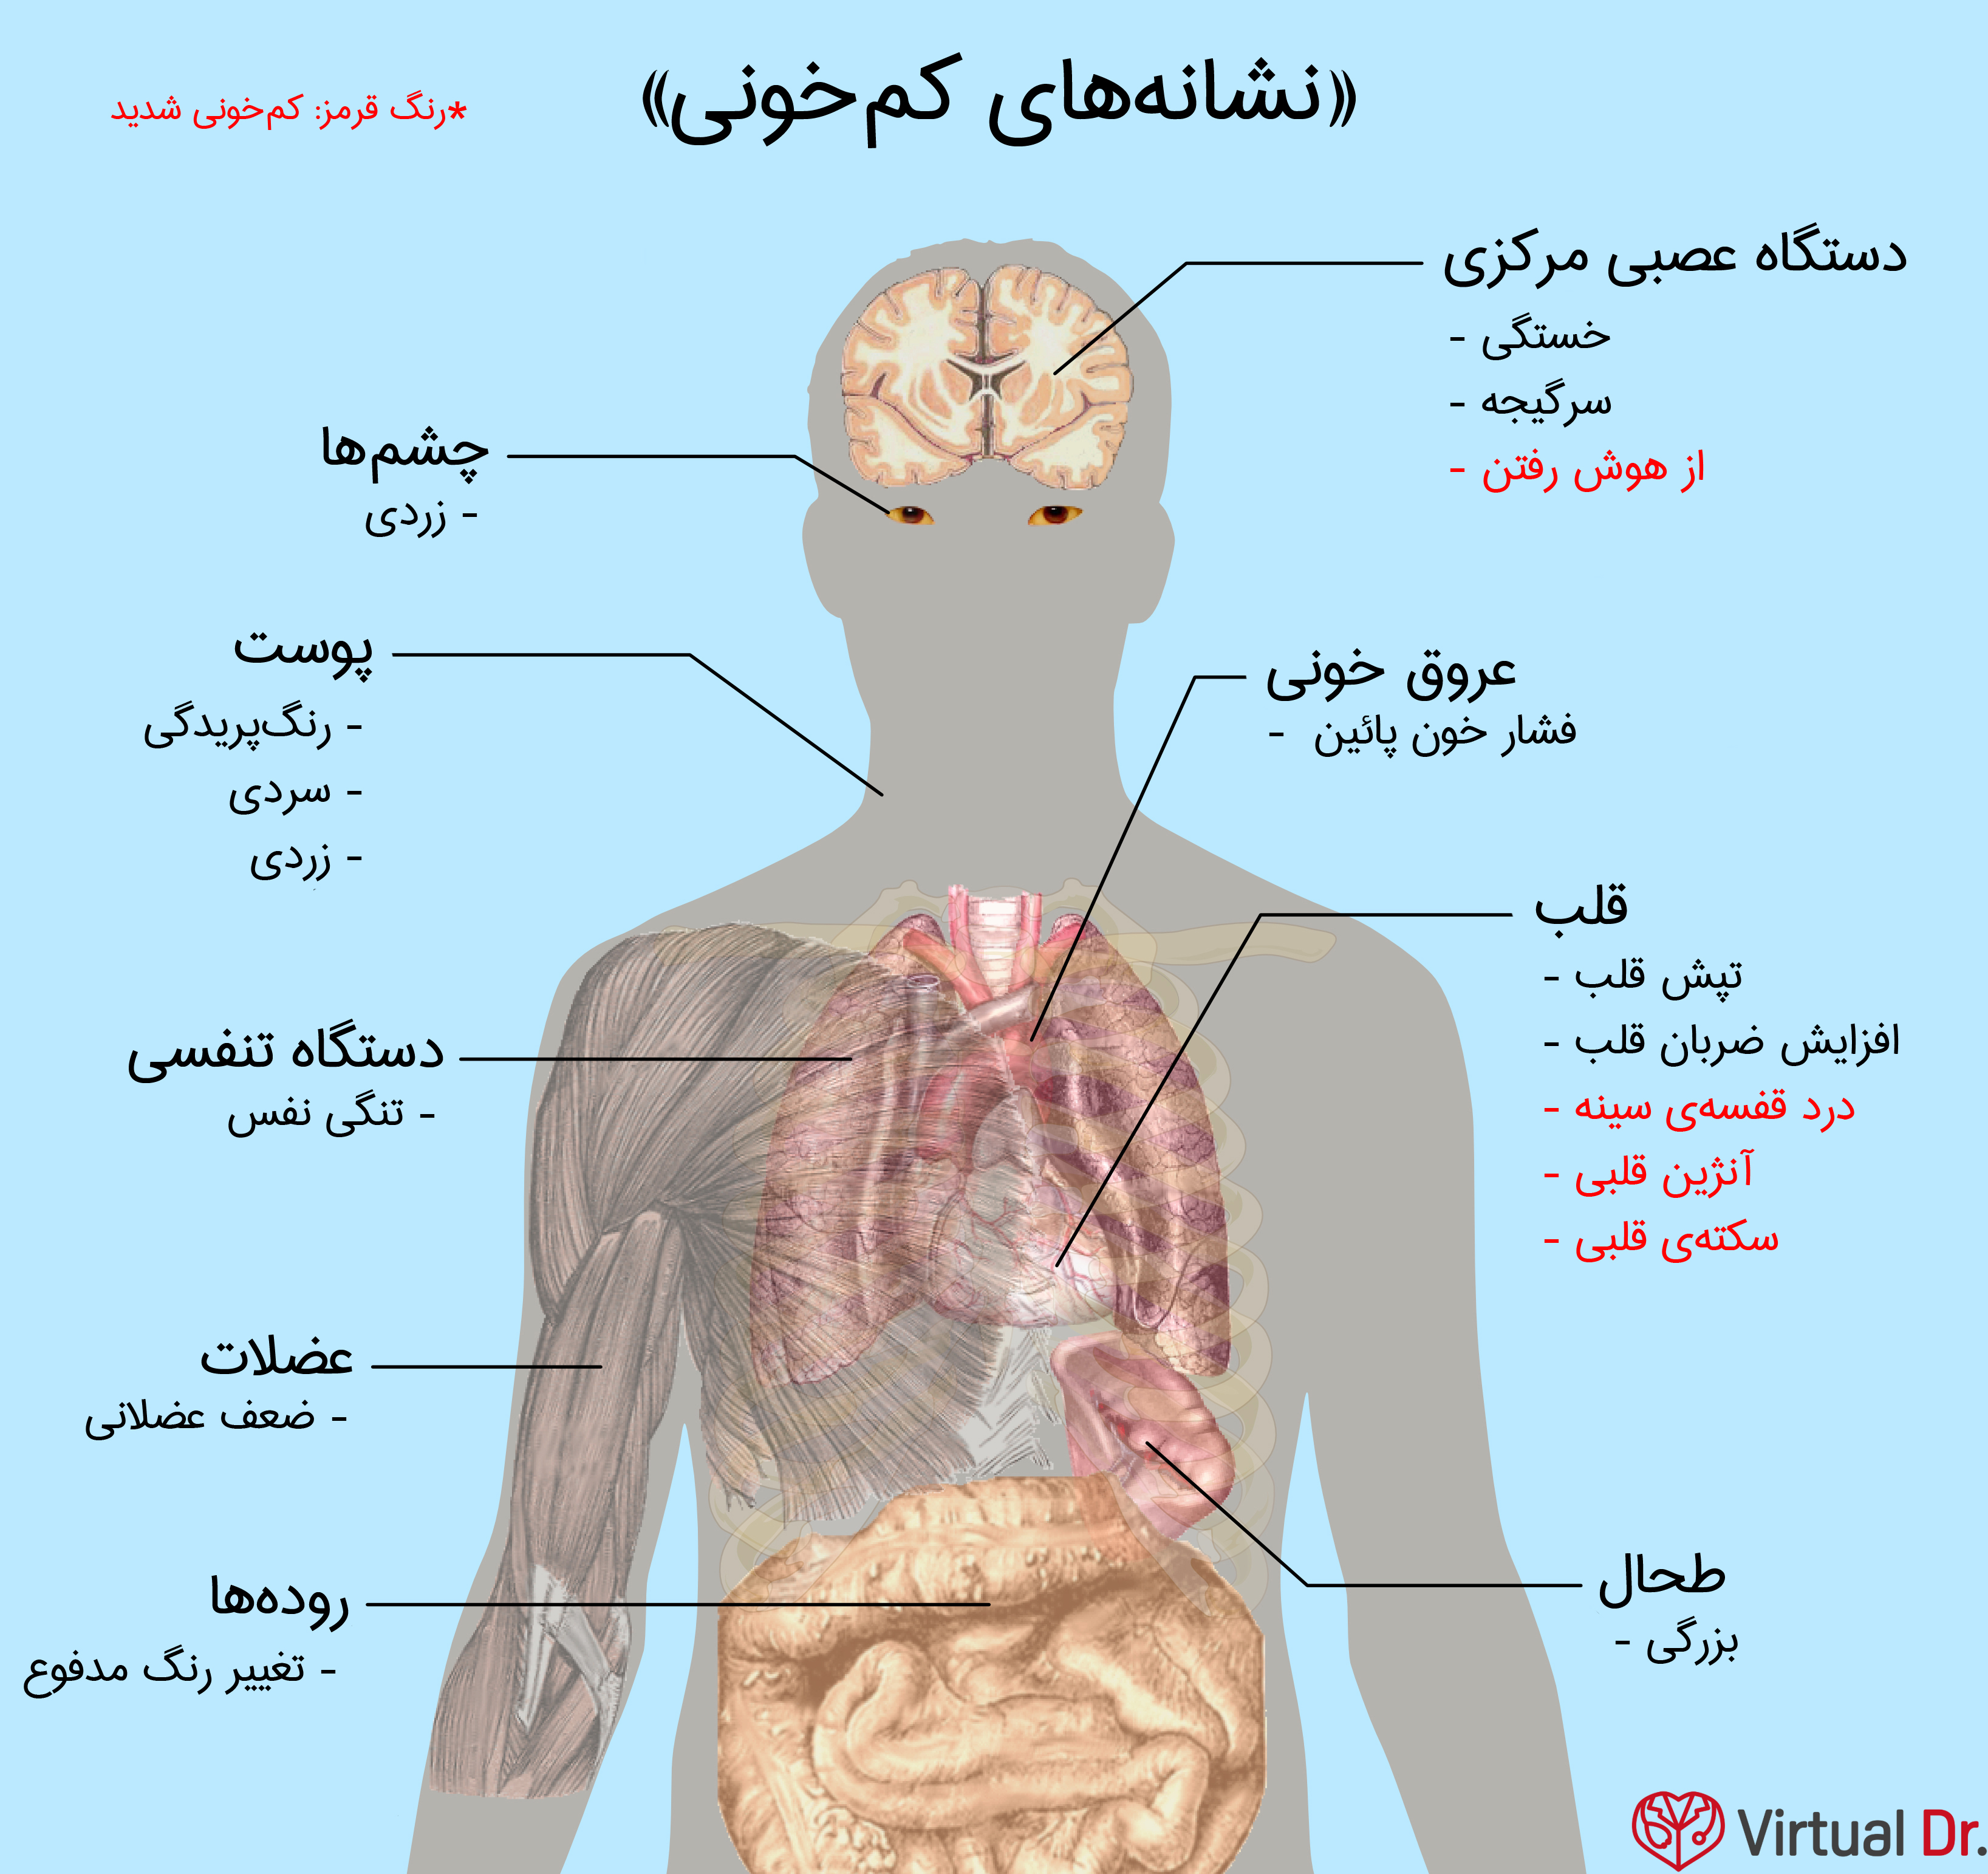 anemia-infograph1-virtualdr